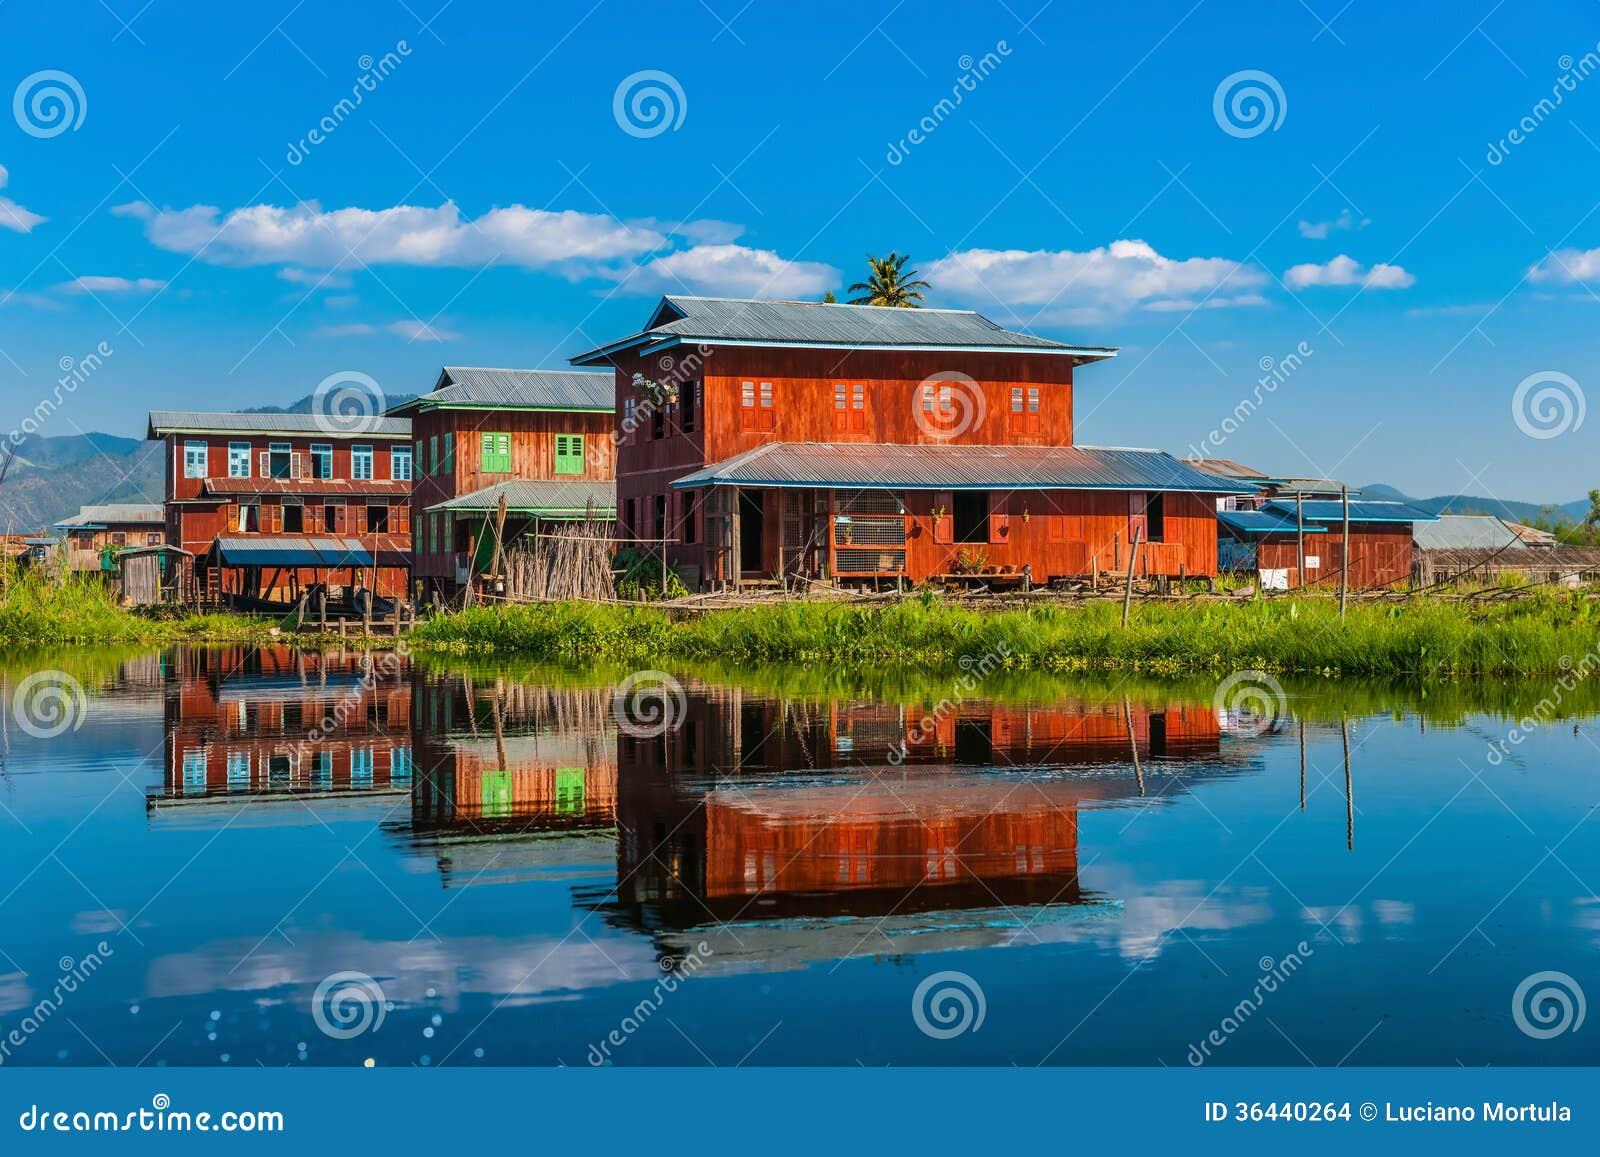 Inle Lake Myanmar Stock Images Image 36440264